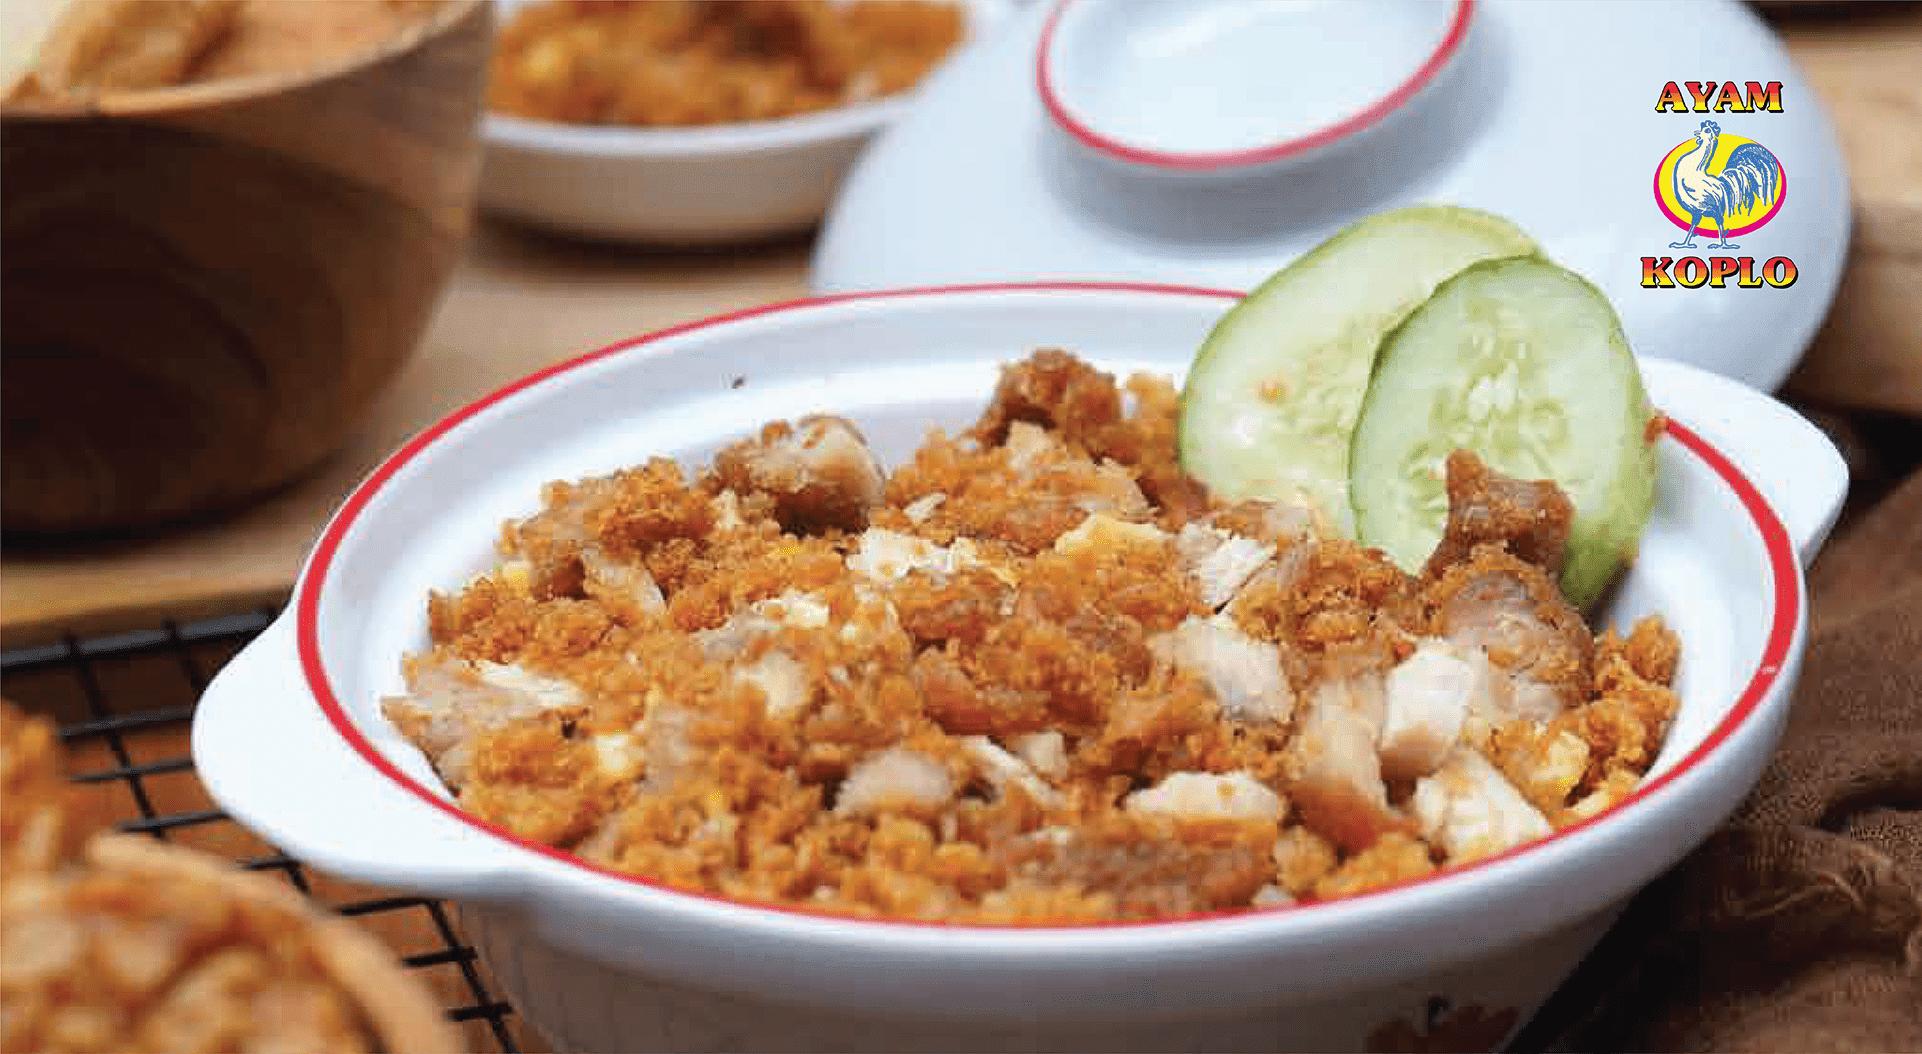 franchise-ayam-koplo-by-hangry-dikembangkan-untuk-pilihan-menu-khas-nusantara-di-hangry